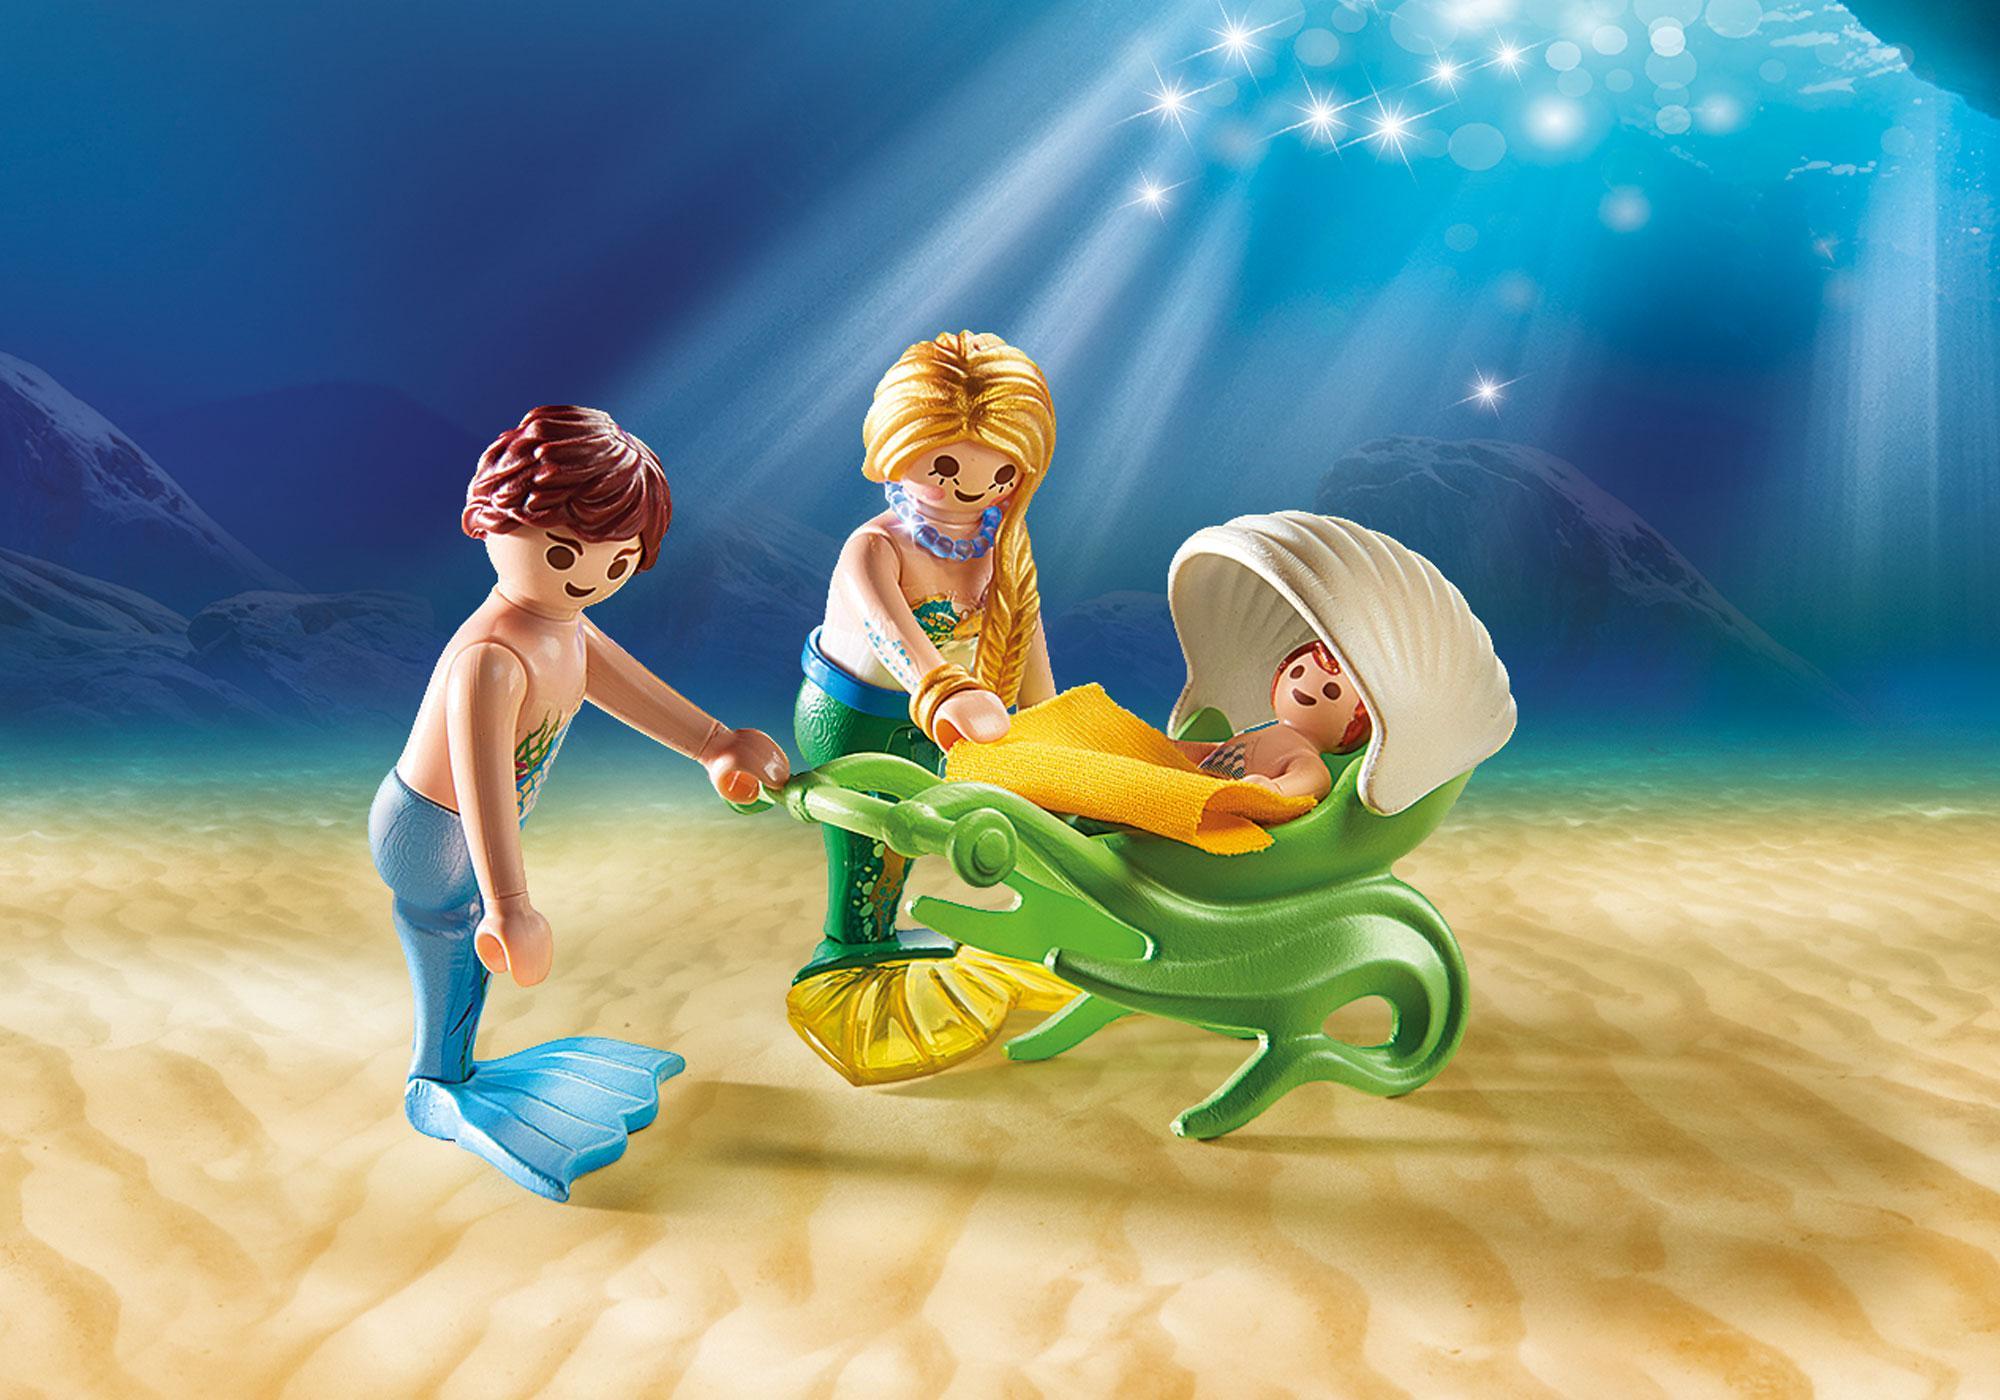 http://media.playmobil.com/i/playmobil/70100_product_extra1/Familie mit Muschelkinderwagen